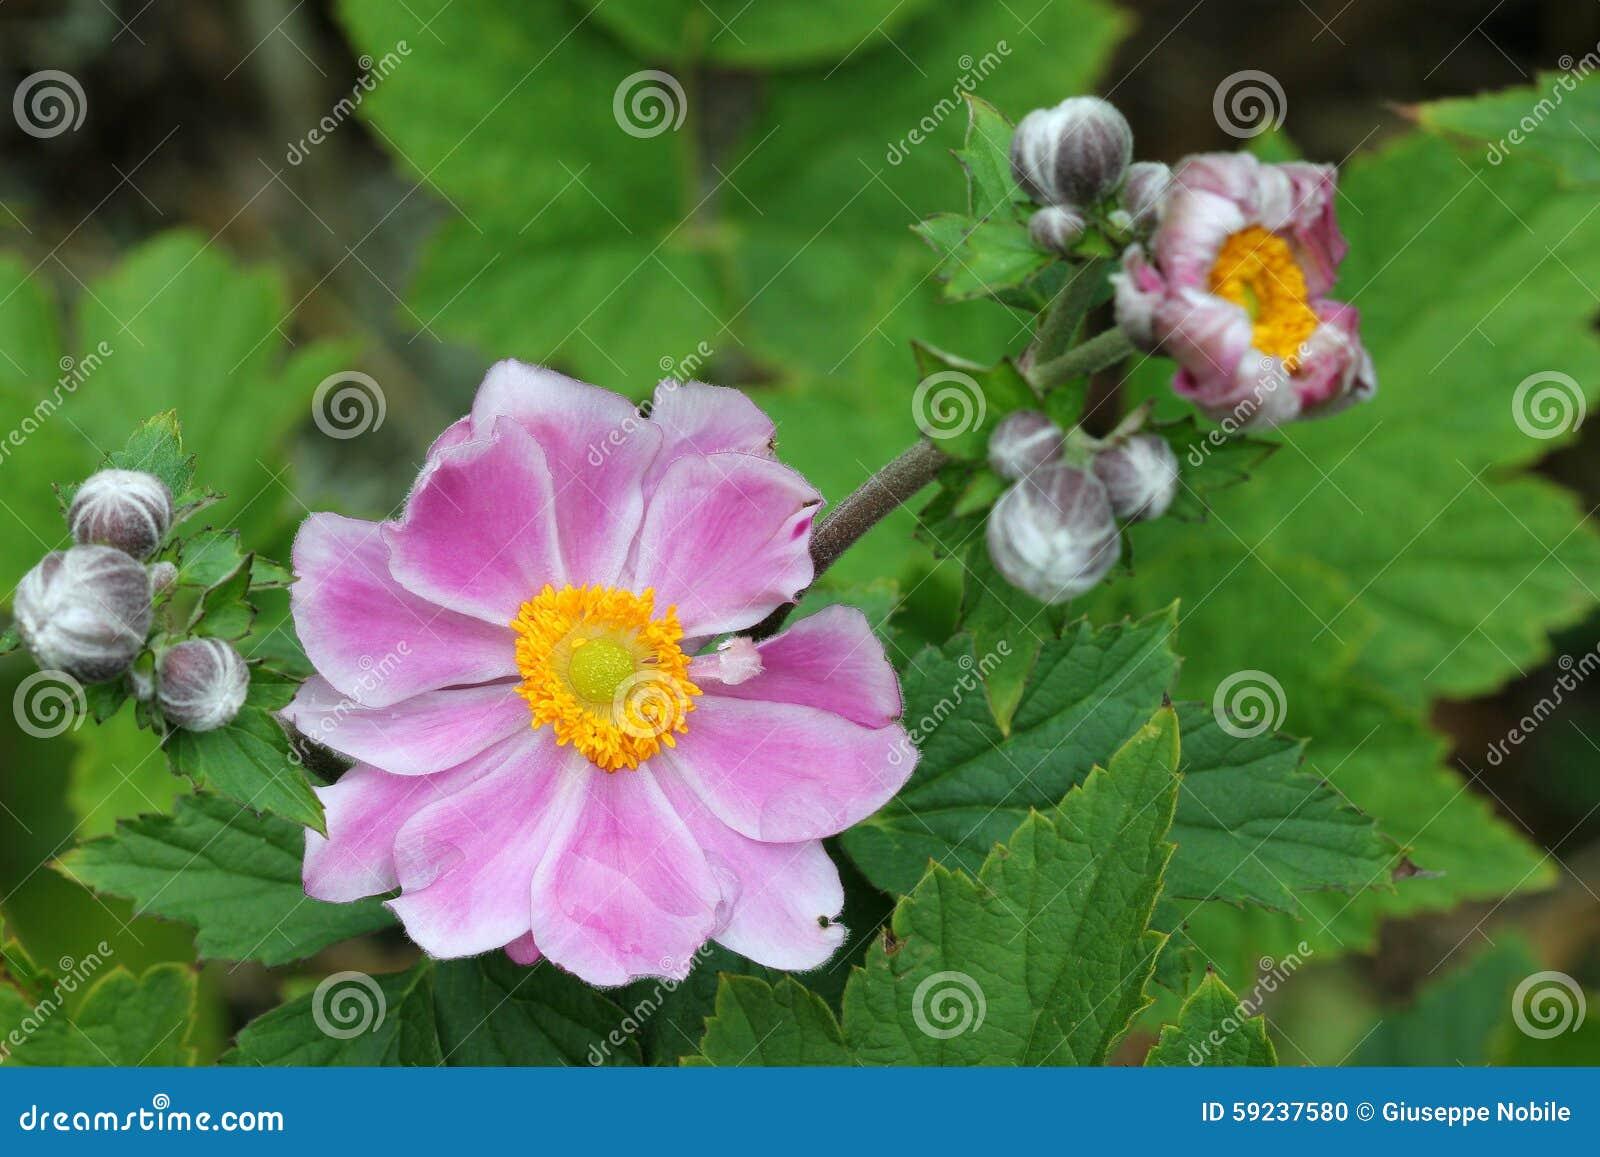 Download Anemone Japonica foto de archivo. Imagen de jardín, hermoso - 59237580